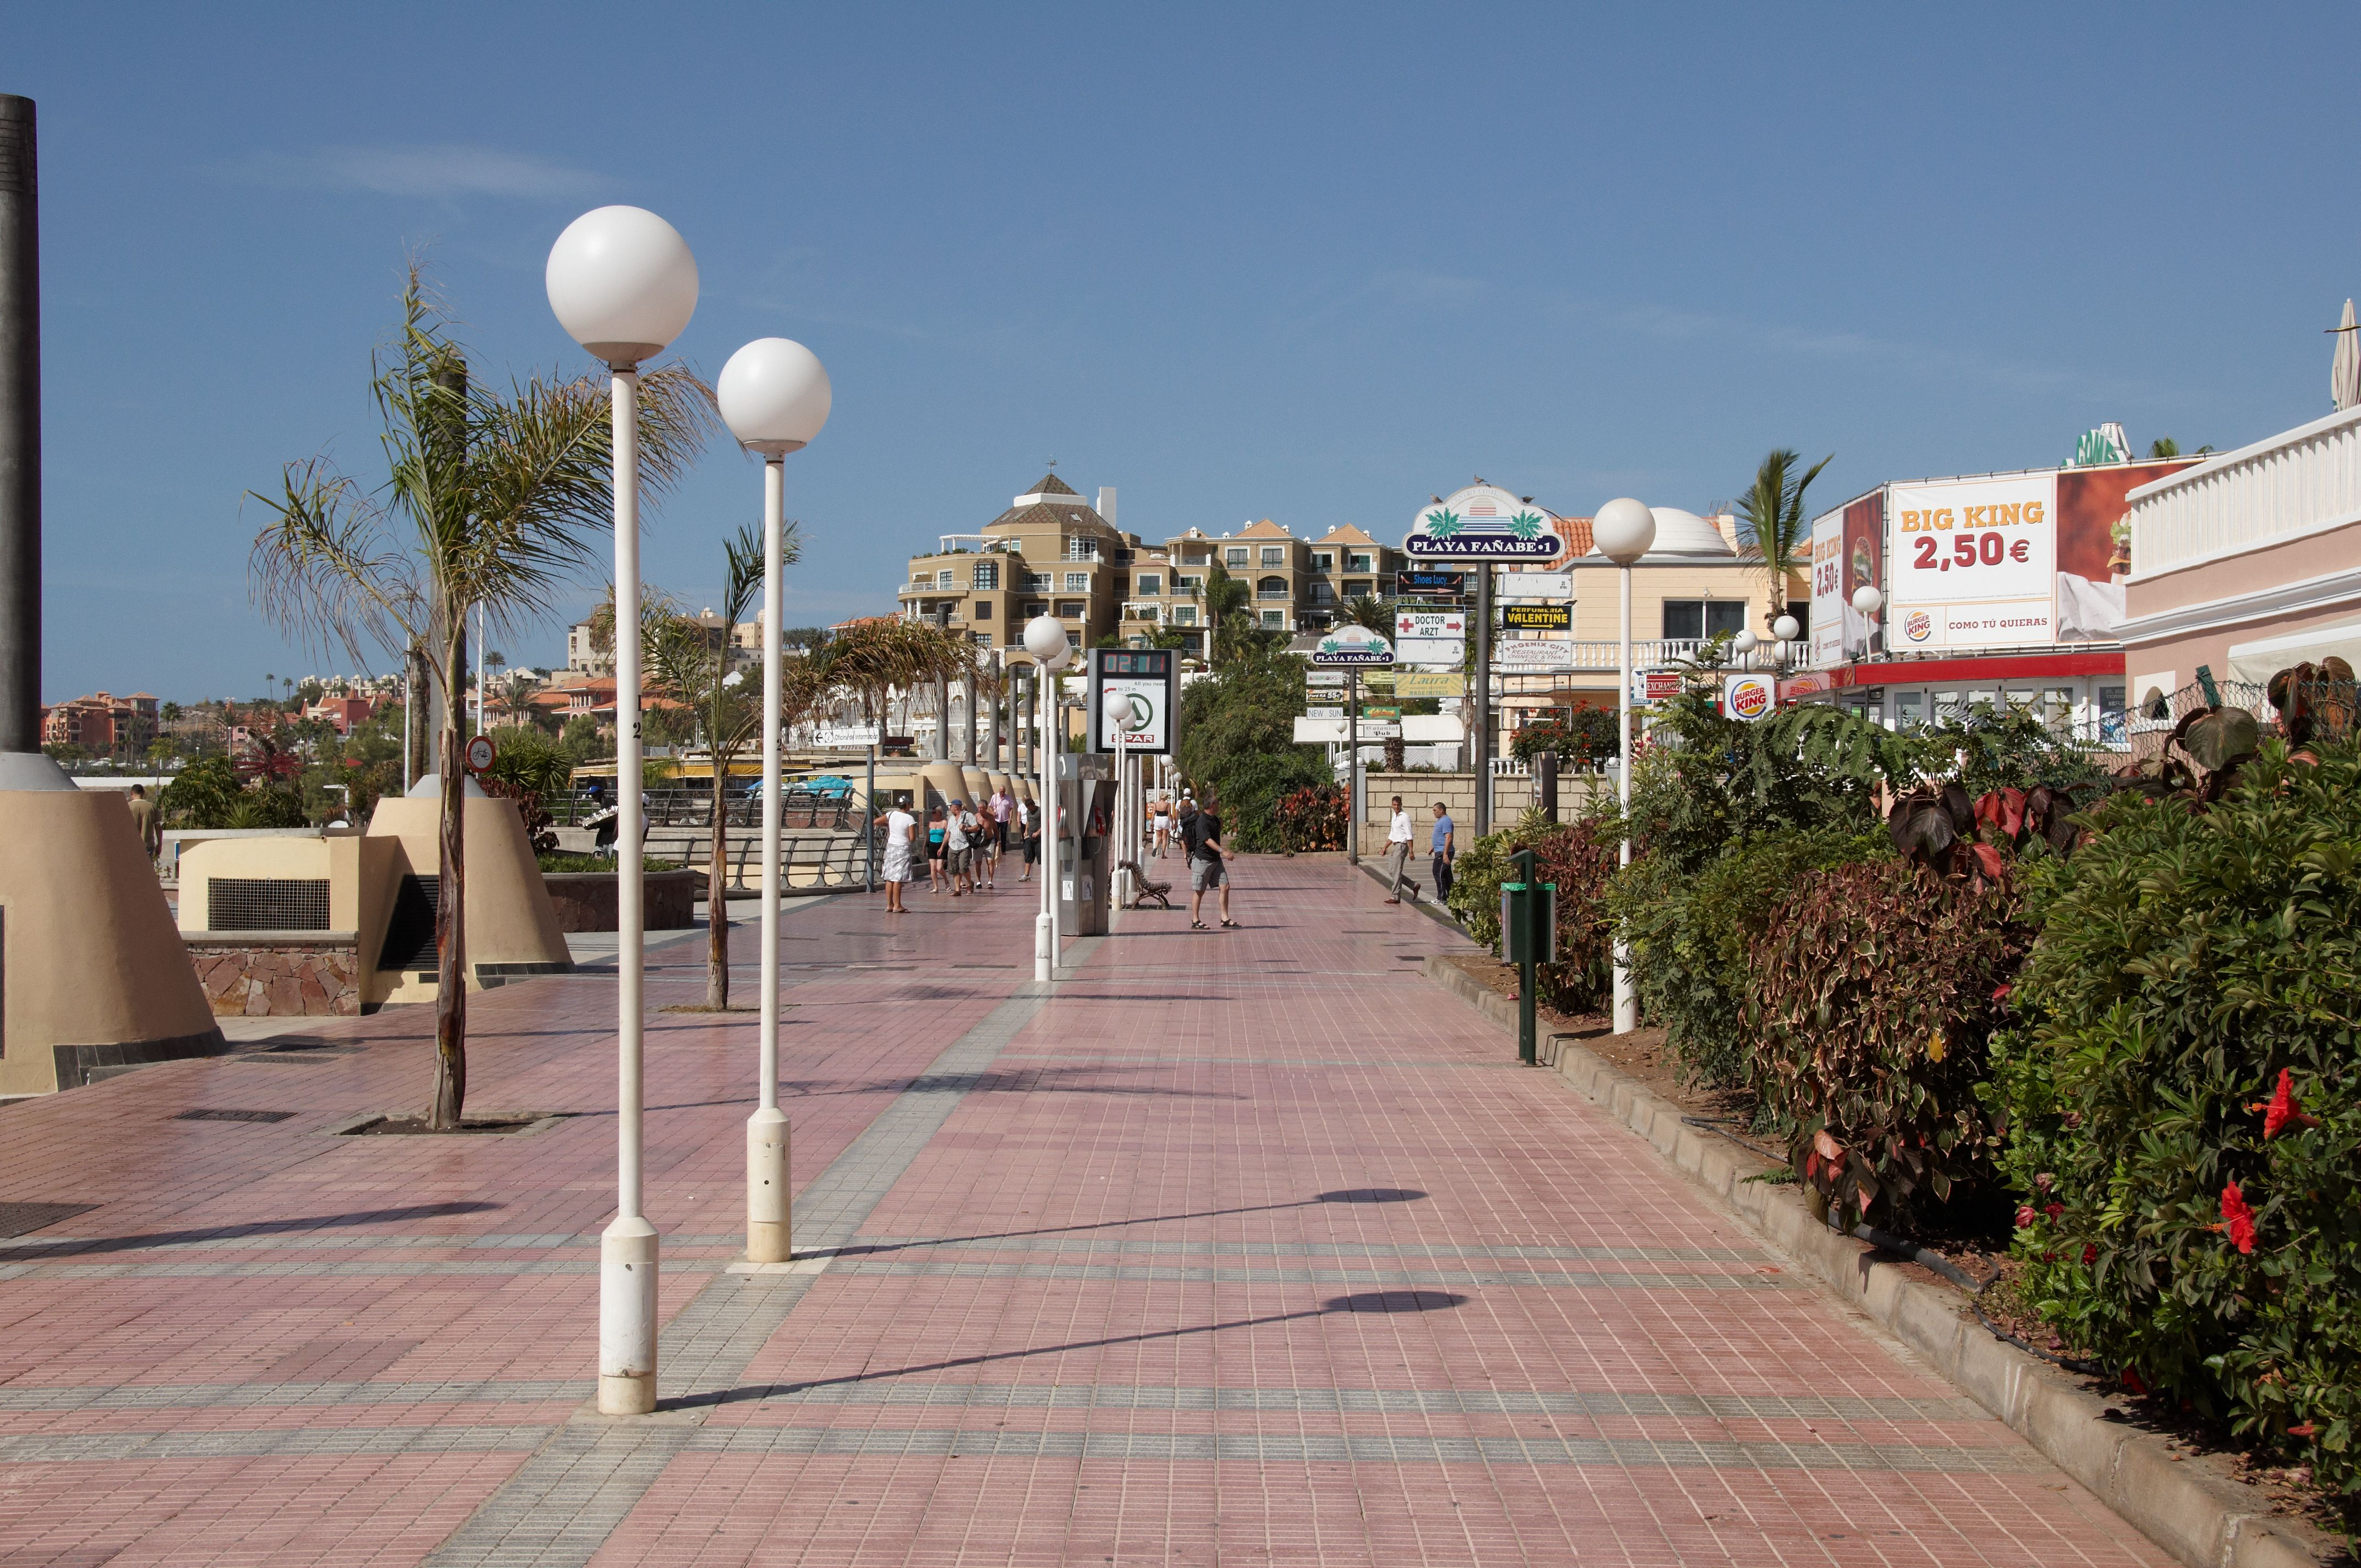 Gran Hotel Adeje Tenerife